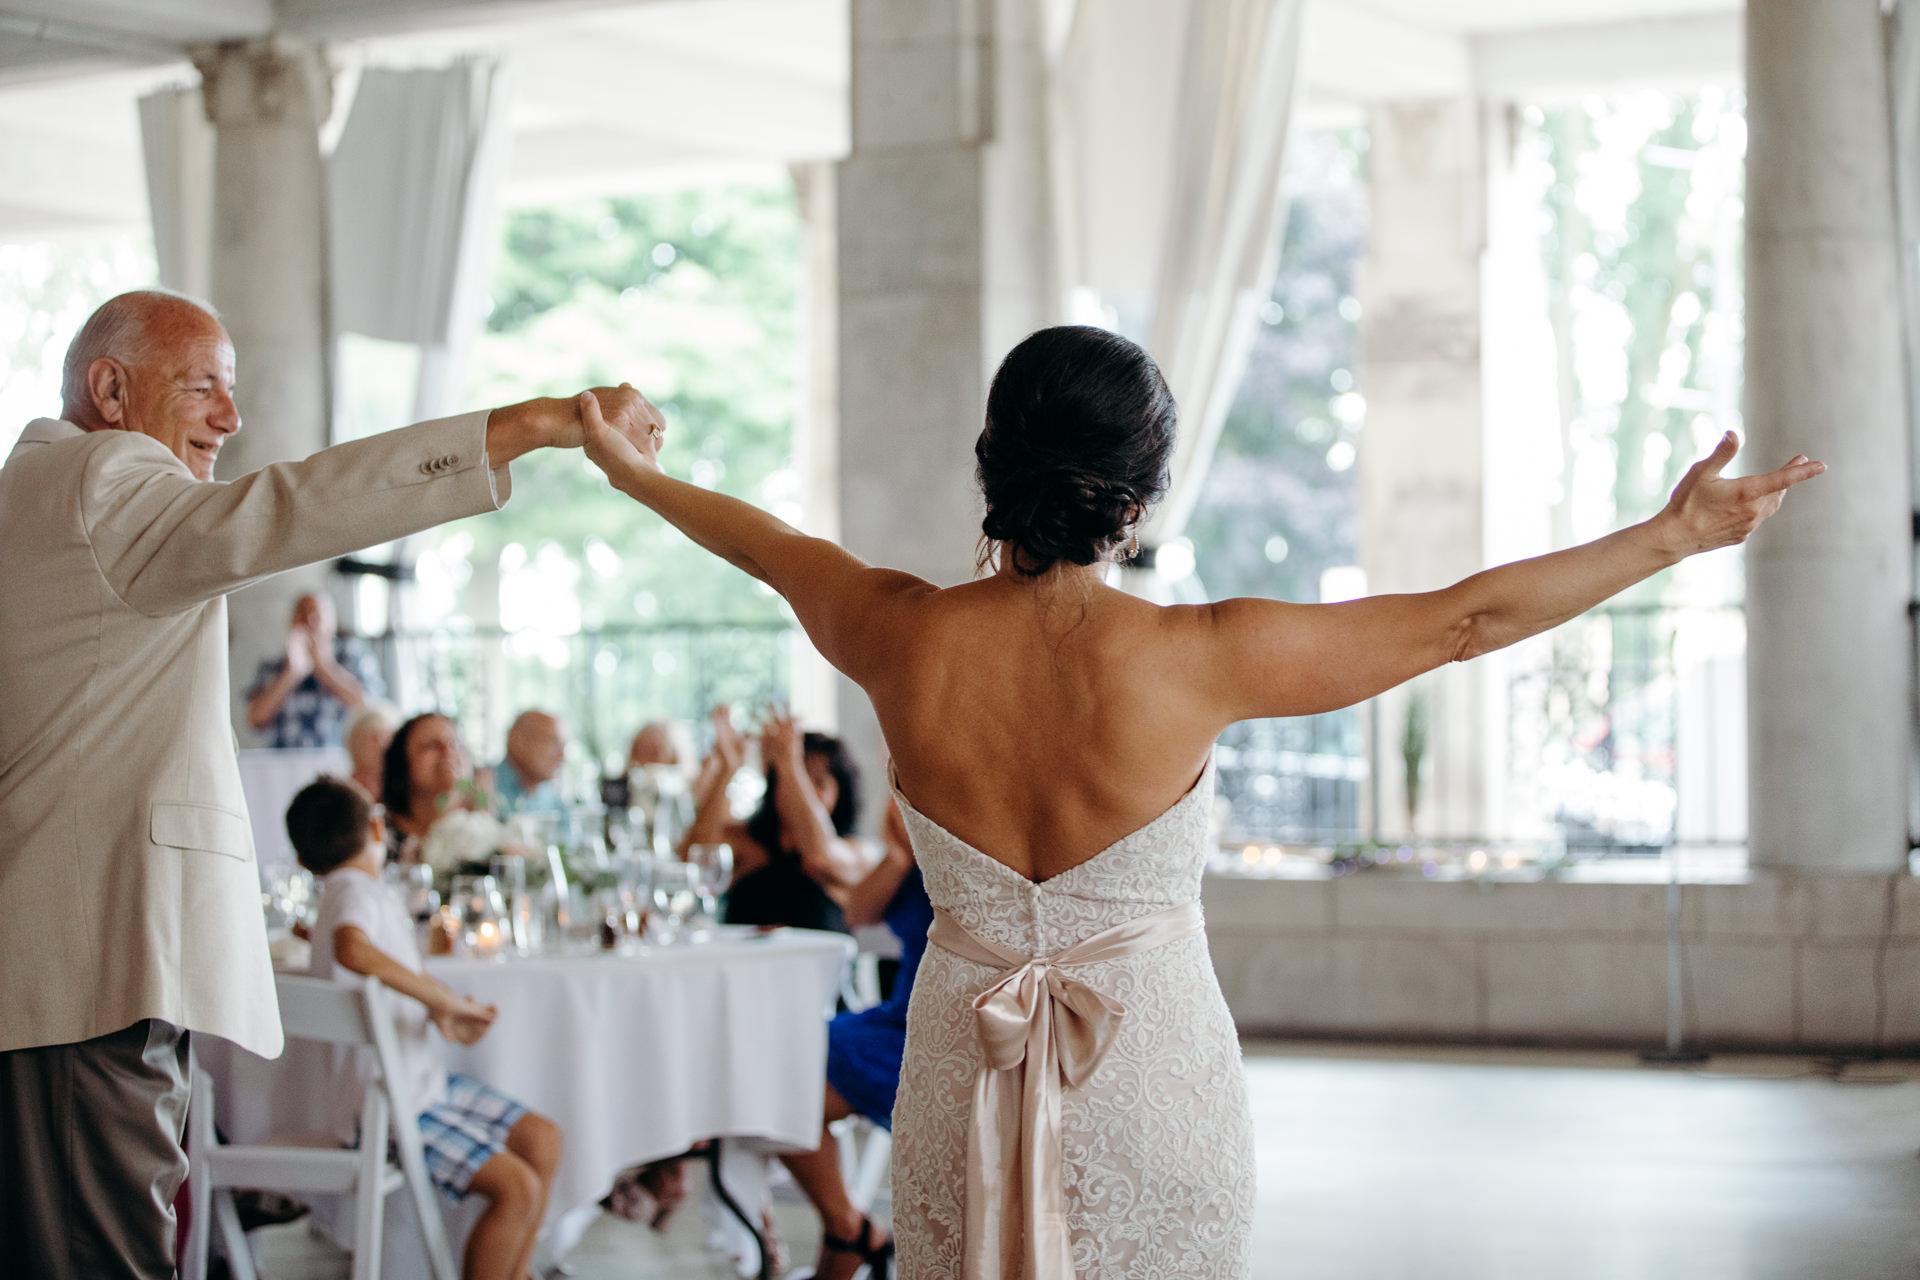 Grant Beachy Tammy Chris wedding photography goshen Saint Joseph veranda whitcomb-071.jpg